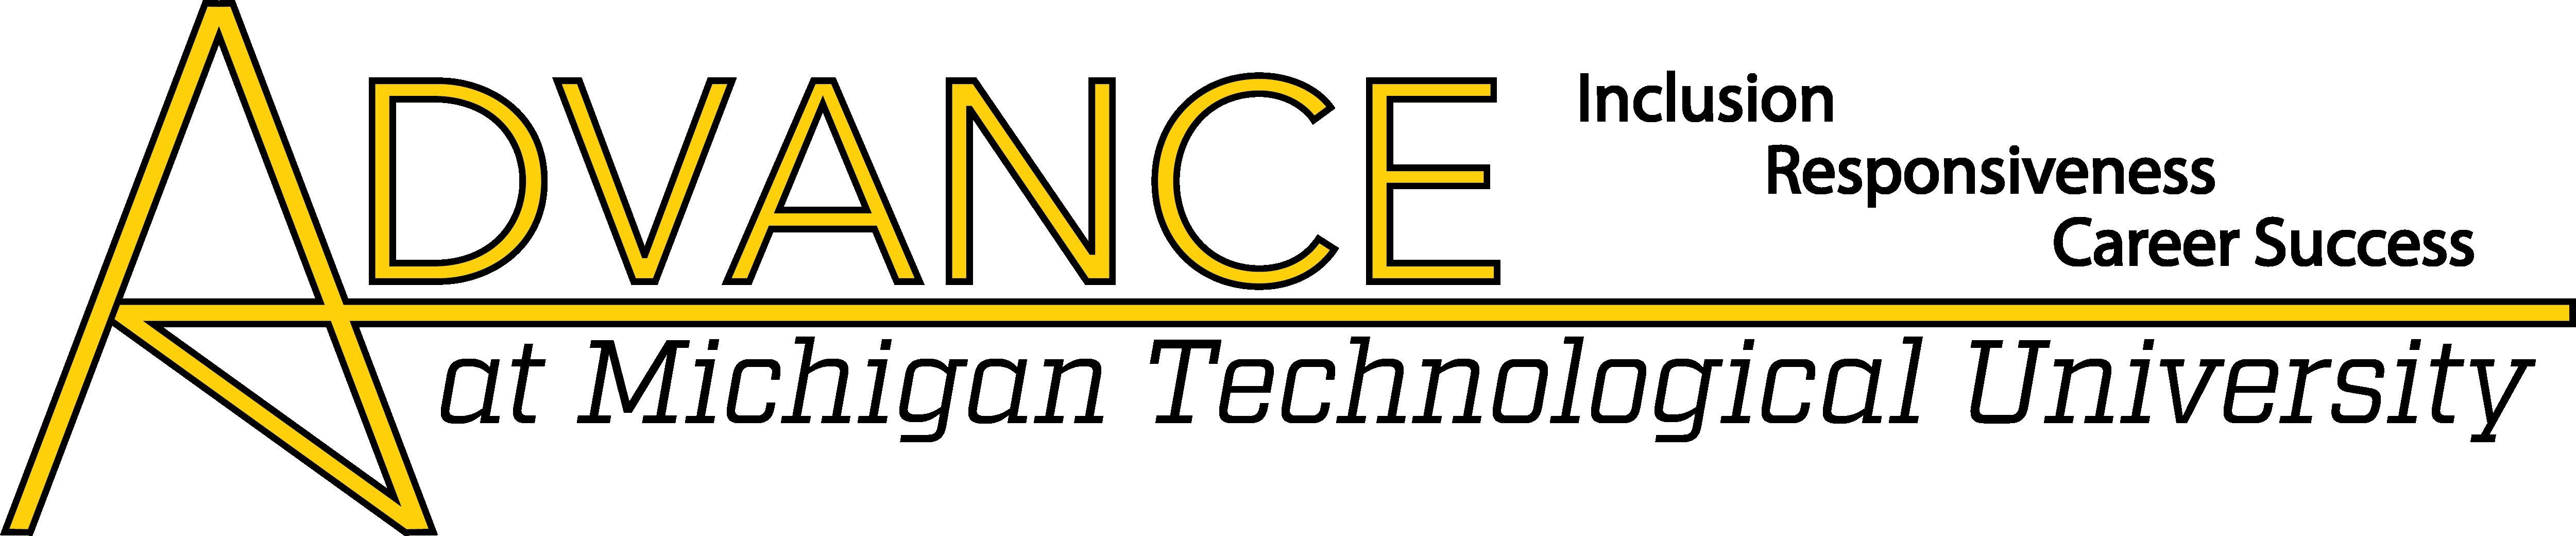 The ADVANCE Initiative